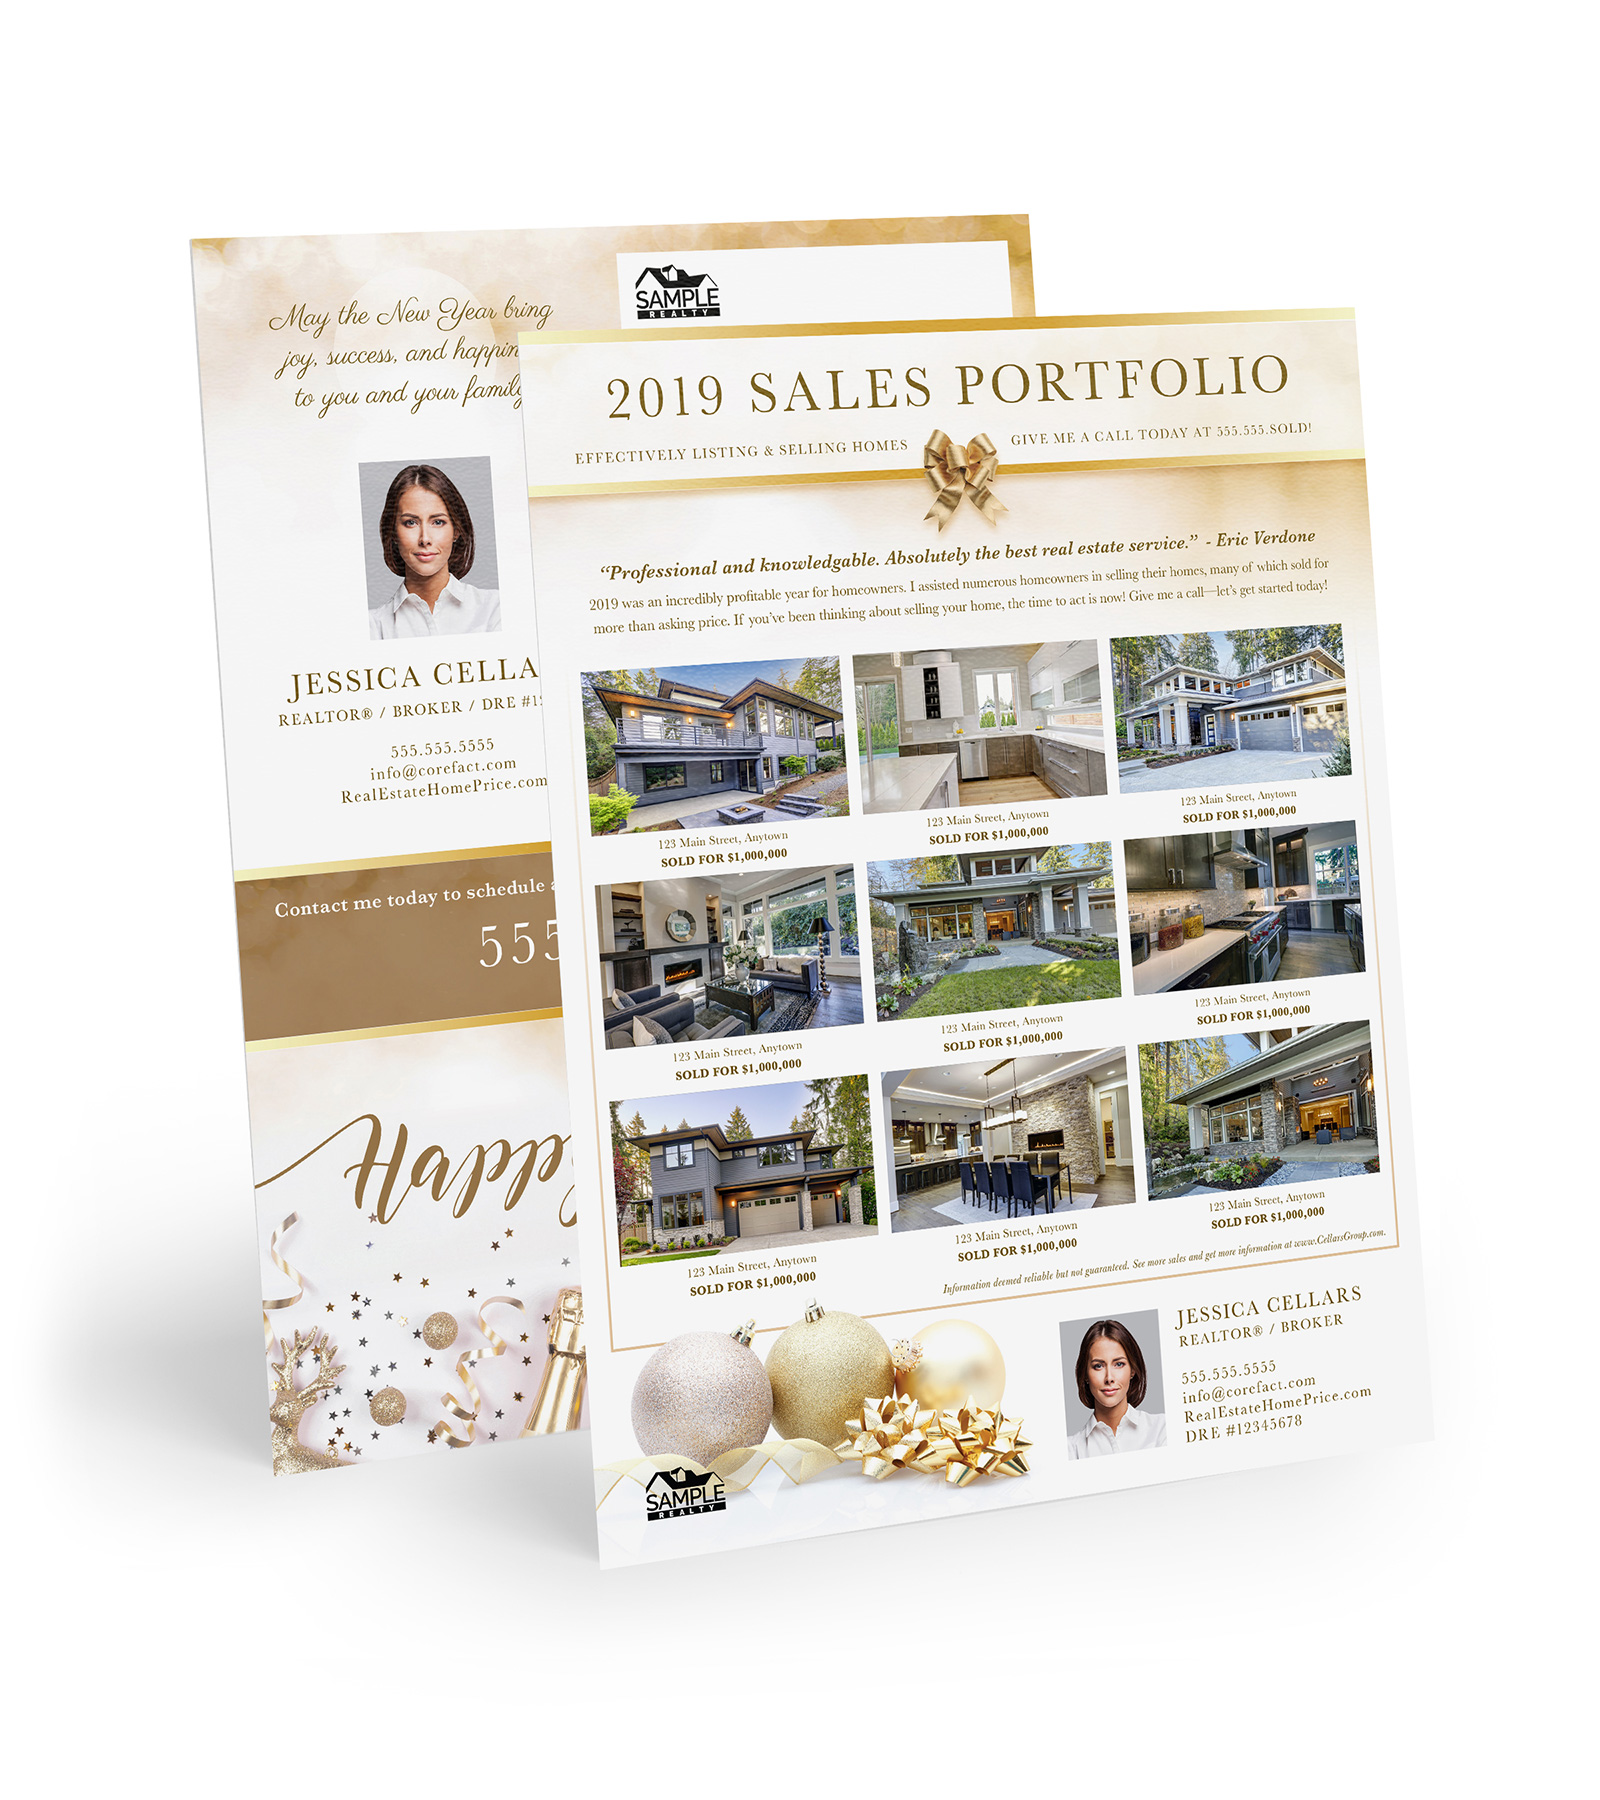 Corefact Sales Portfolio 2019 - 02